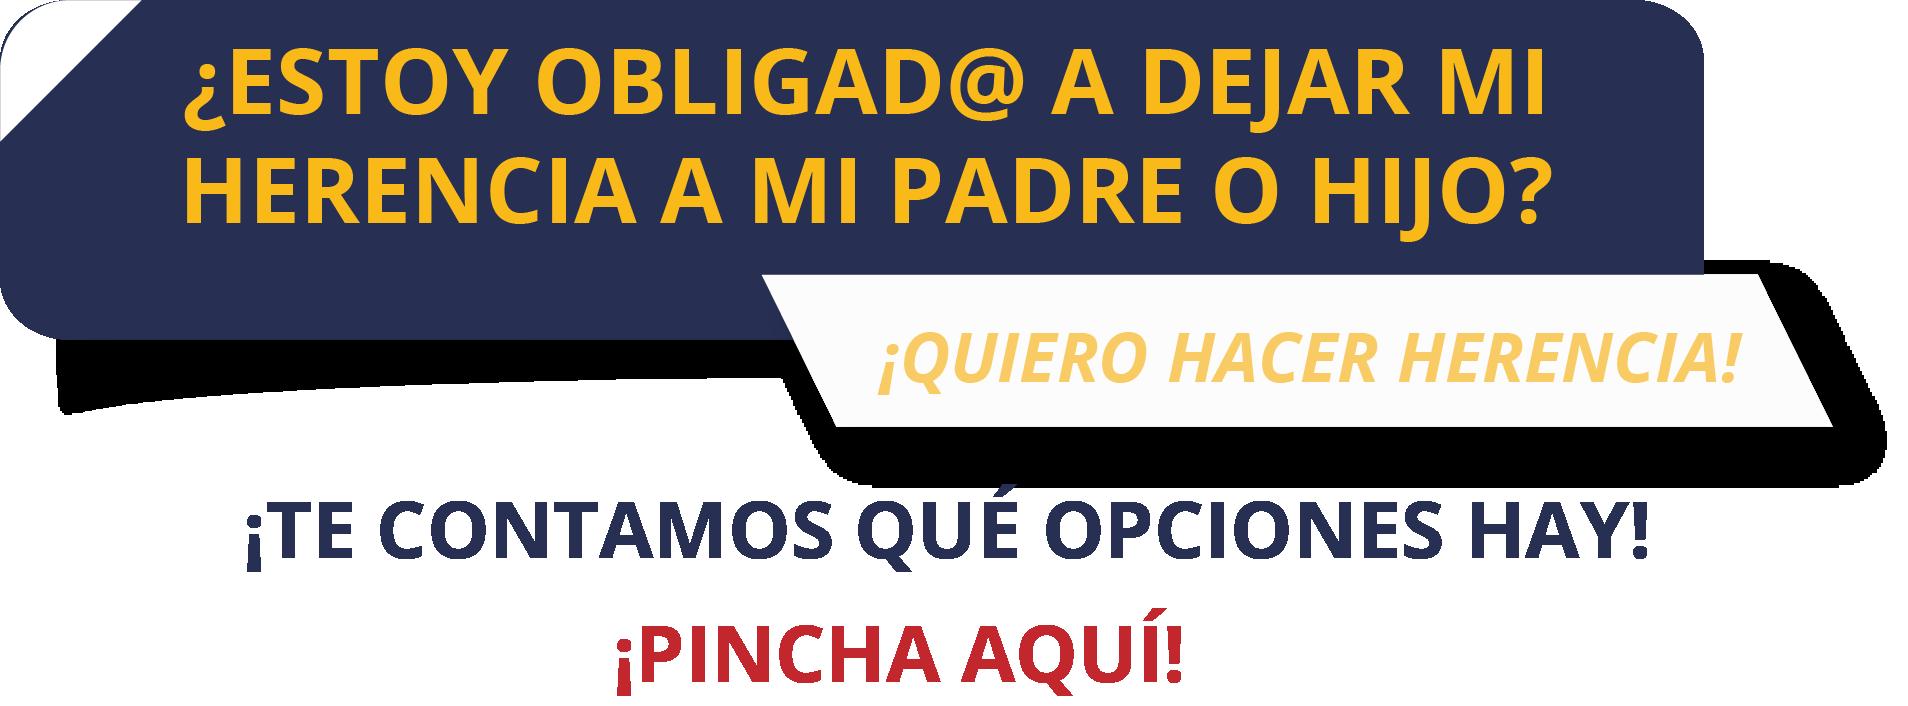 Hacer herencia abogados en Valencia